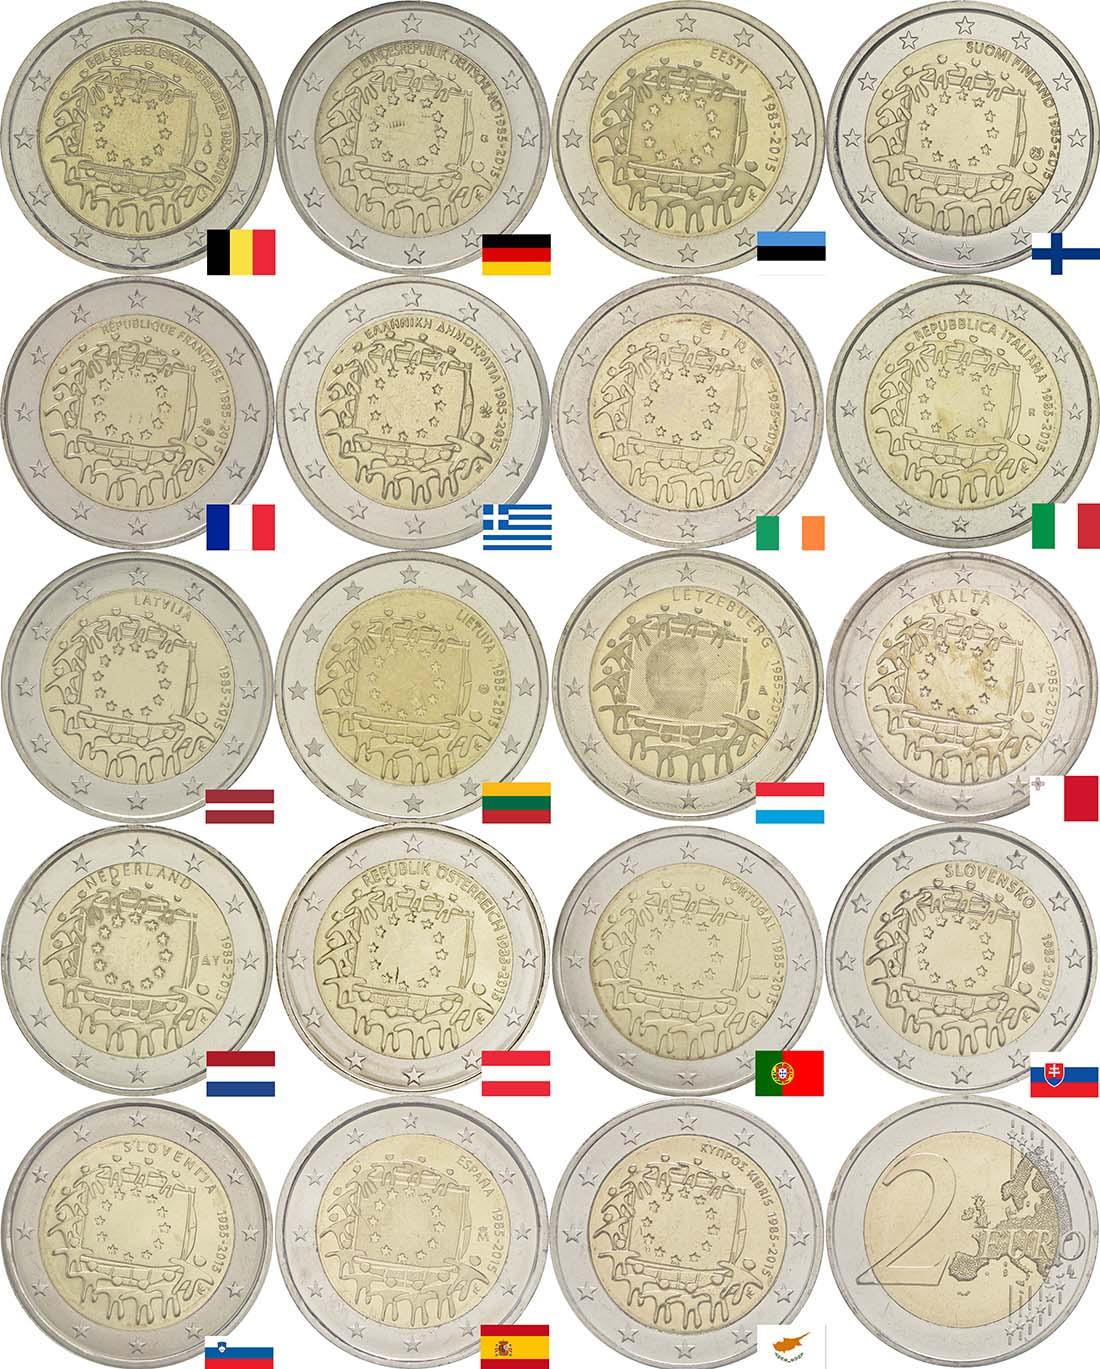 Lieferumfang:International : 2 Euro 30 Jahre Europäische Flagge Komplettsatz B, D (ein Prägebuchstabe unserer Wahl), EST,FIN, F, GR, IRL, I,LV, LT,L , M, NL, A, P, SK, SLO, E, CY  2015 bfr